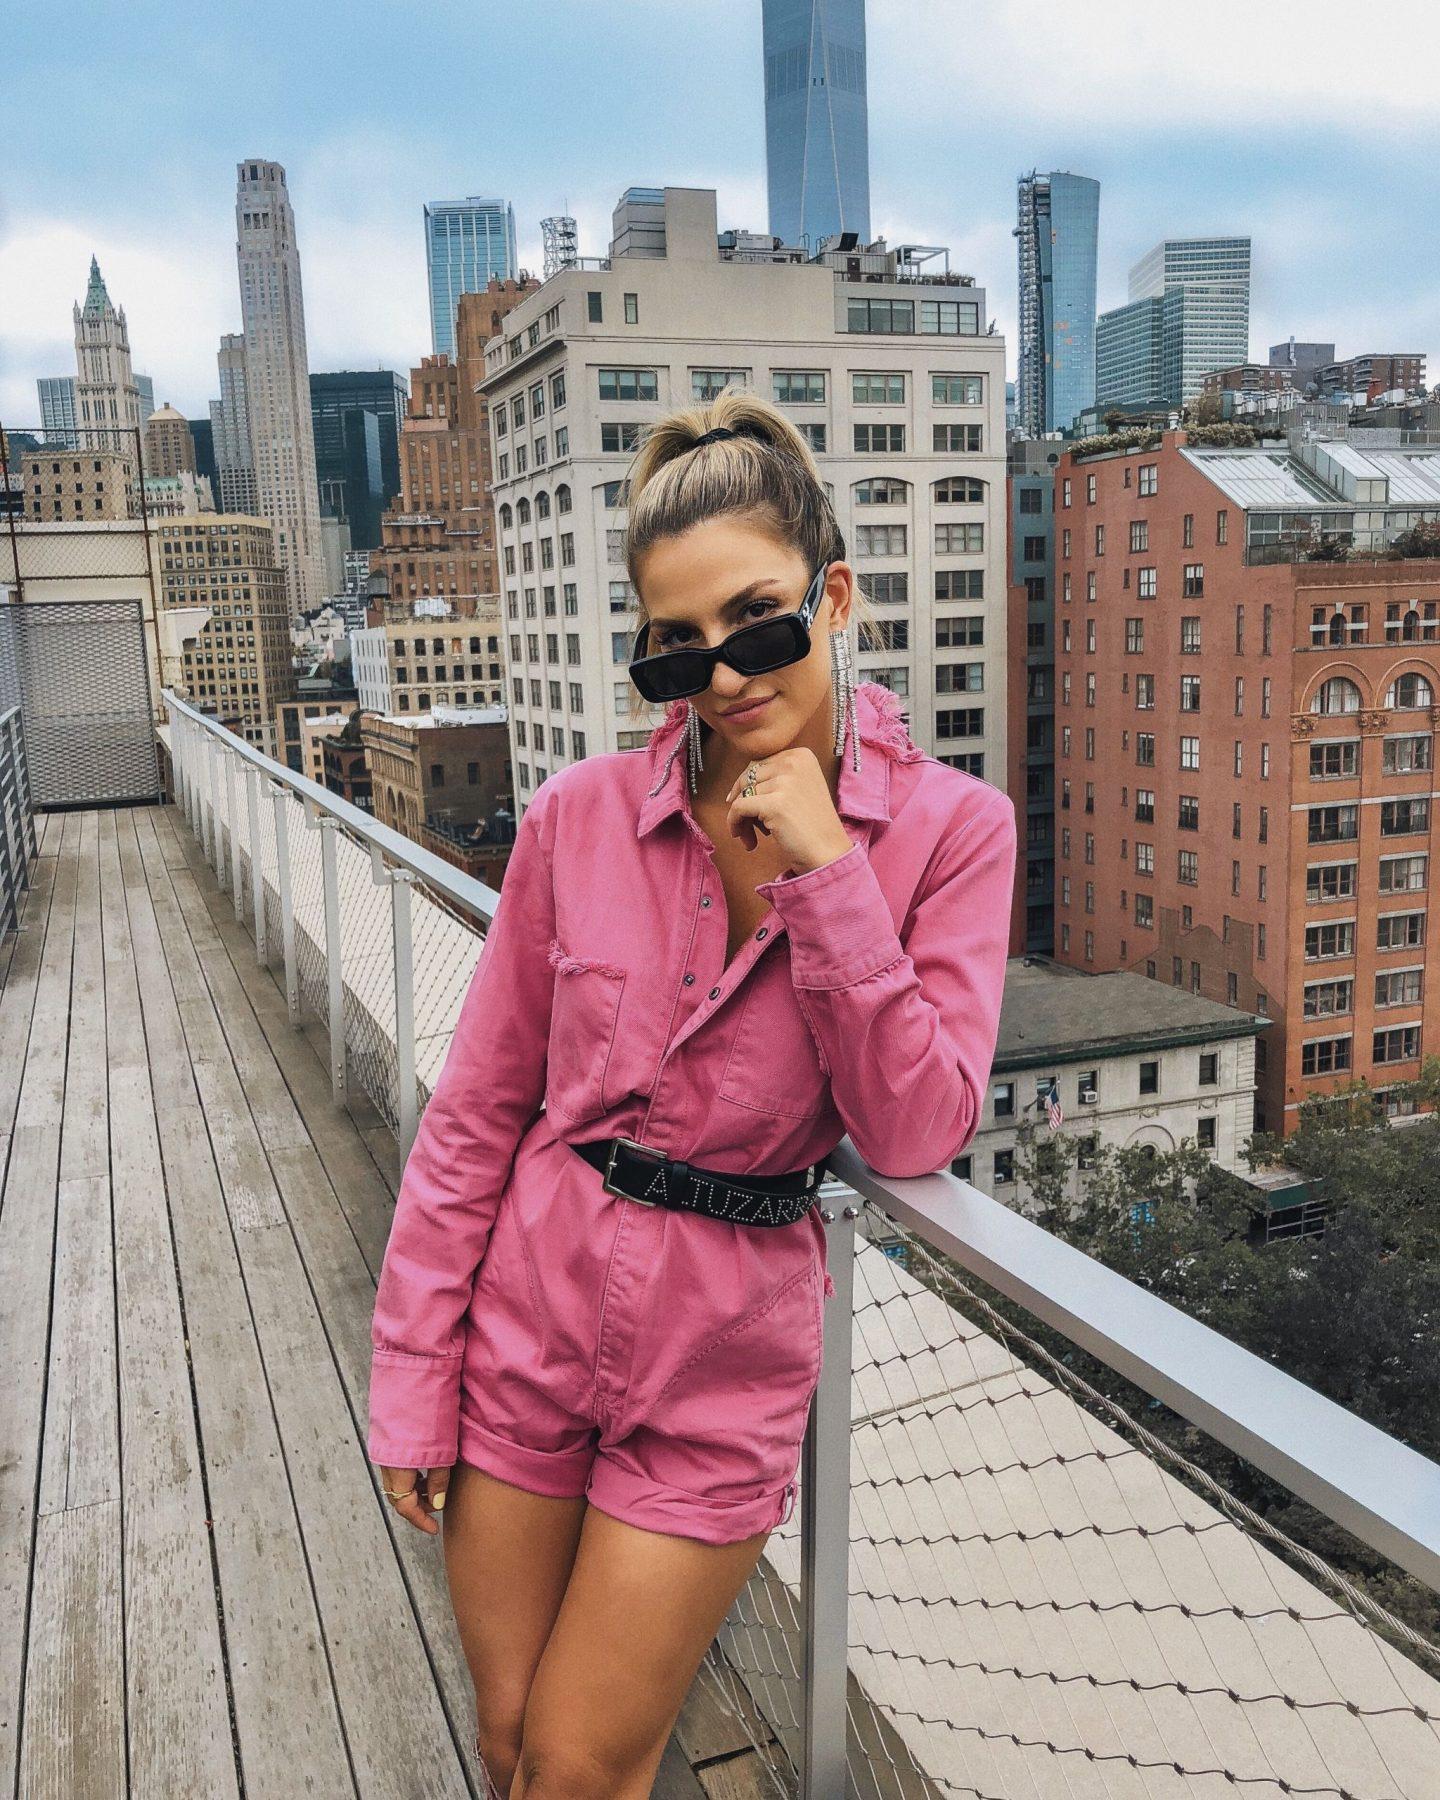 Cassandra DiMicco, Cass DiMicco, Dressed For Dreams, NYC, New York City, New York, Street Style NYC, Street Style 2018, NYC Street Style, NYC Outfit Inspo Street Style Outfits, 2018 Trends, Summer Style, Summer Outfit Inspo, NYC Fashion Blogger, NYC Fashion Blogger, NYC to do list, NYC to do, NYC bucket list, NYC Instagram Spots, NYFW Outfit, NYFW Inspo, One Teaspoon pink jumpsuit, one teaspoon, off white sunglasses, off white, altuzarra belt, altuzarra, altuzarra gladiator heels, altuzarra pink snakeskin, Alexander wang belt bag, Alexander wang fanny pack, Alexander wang